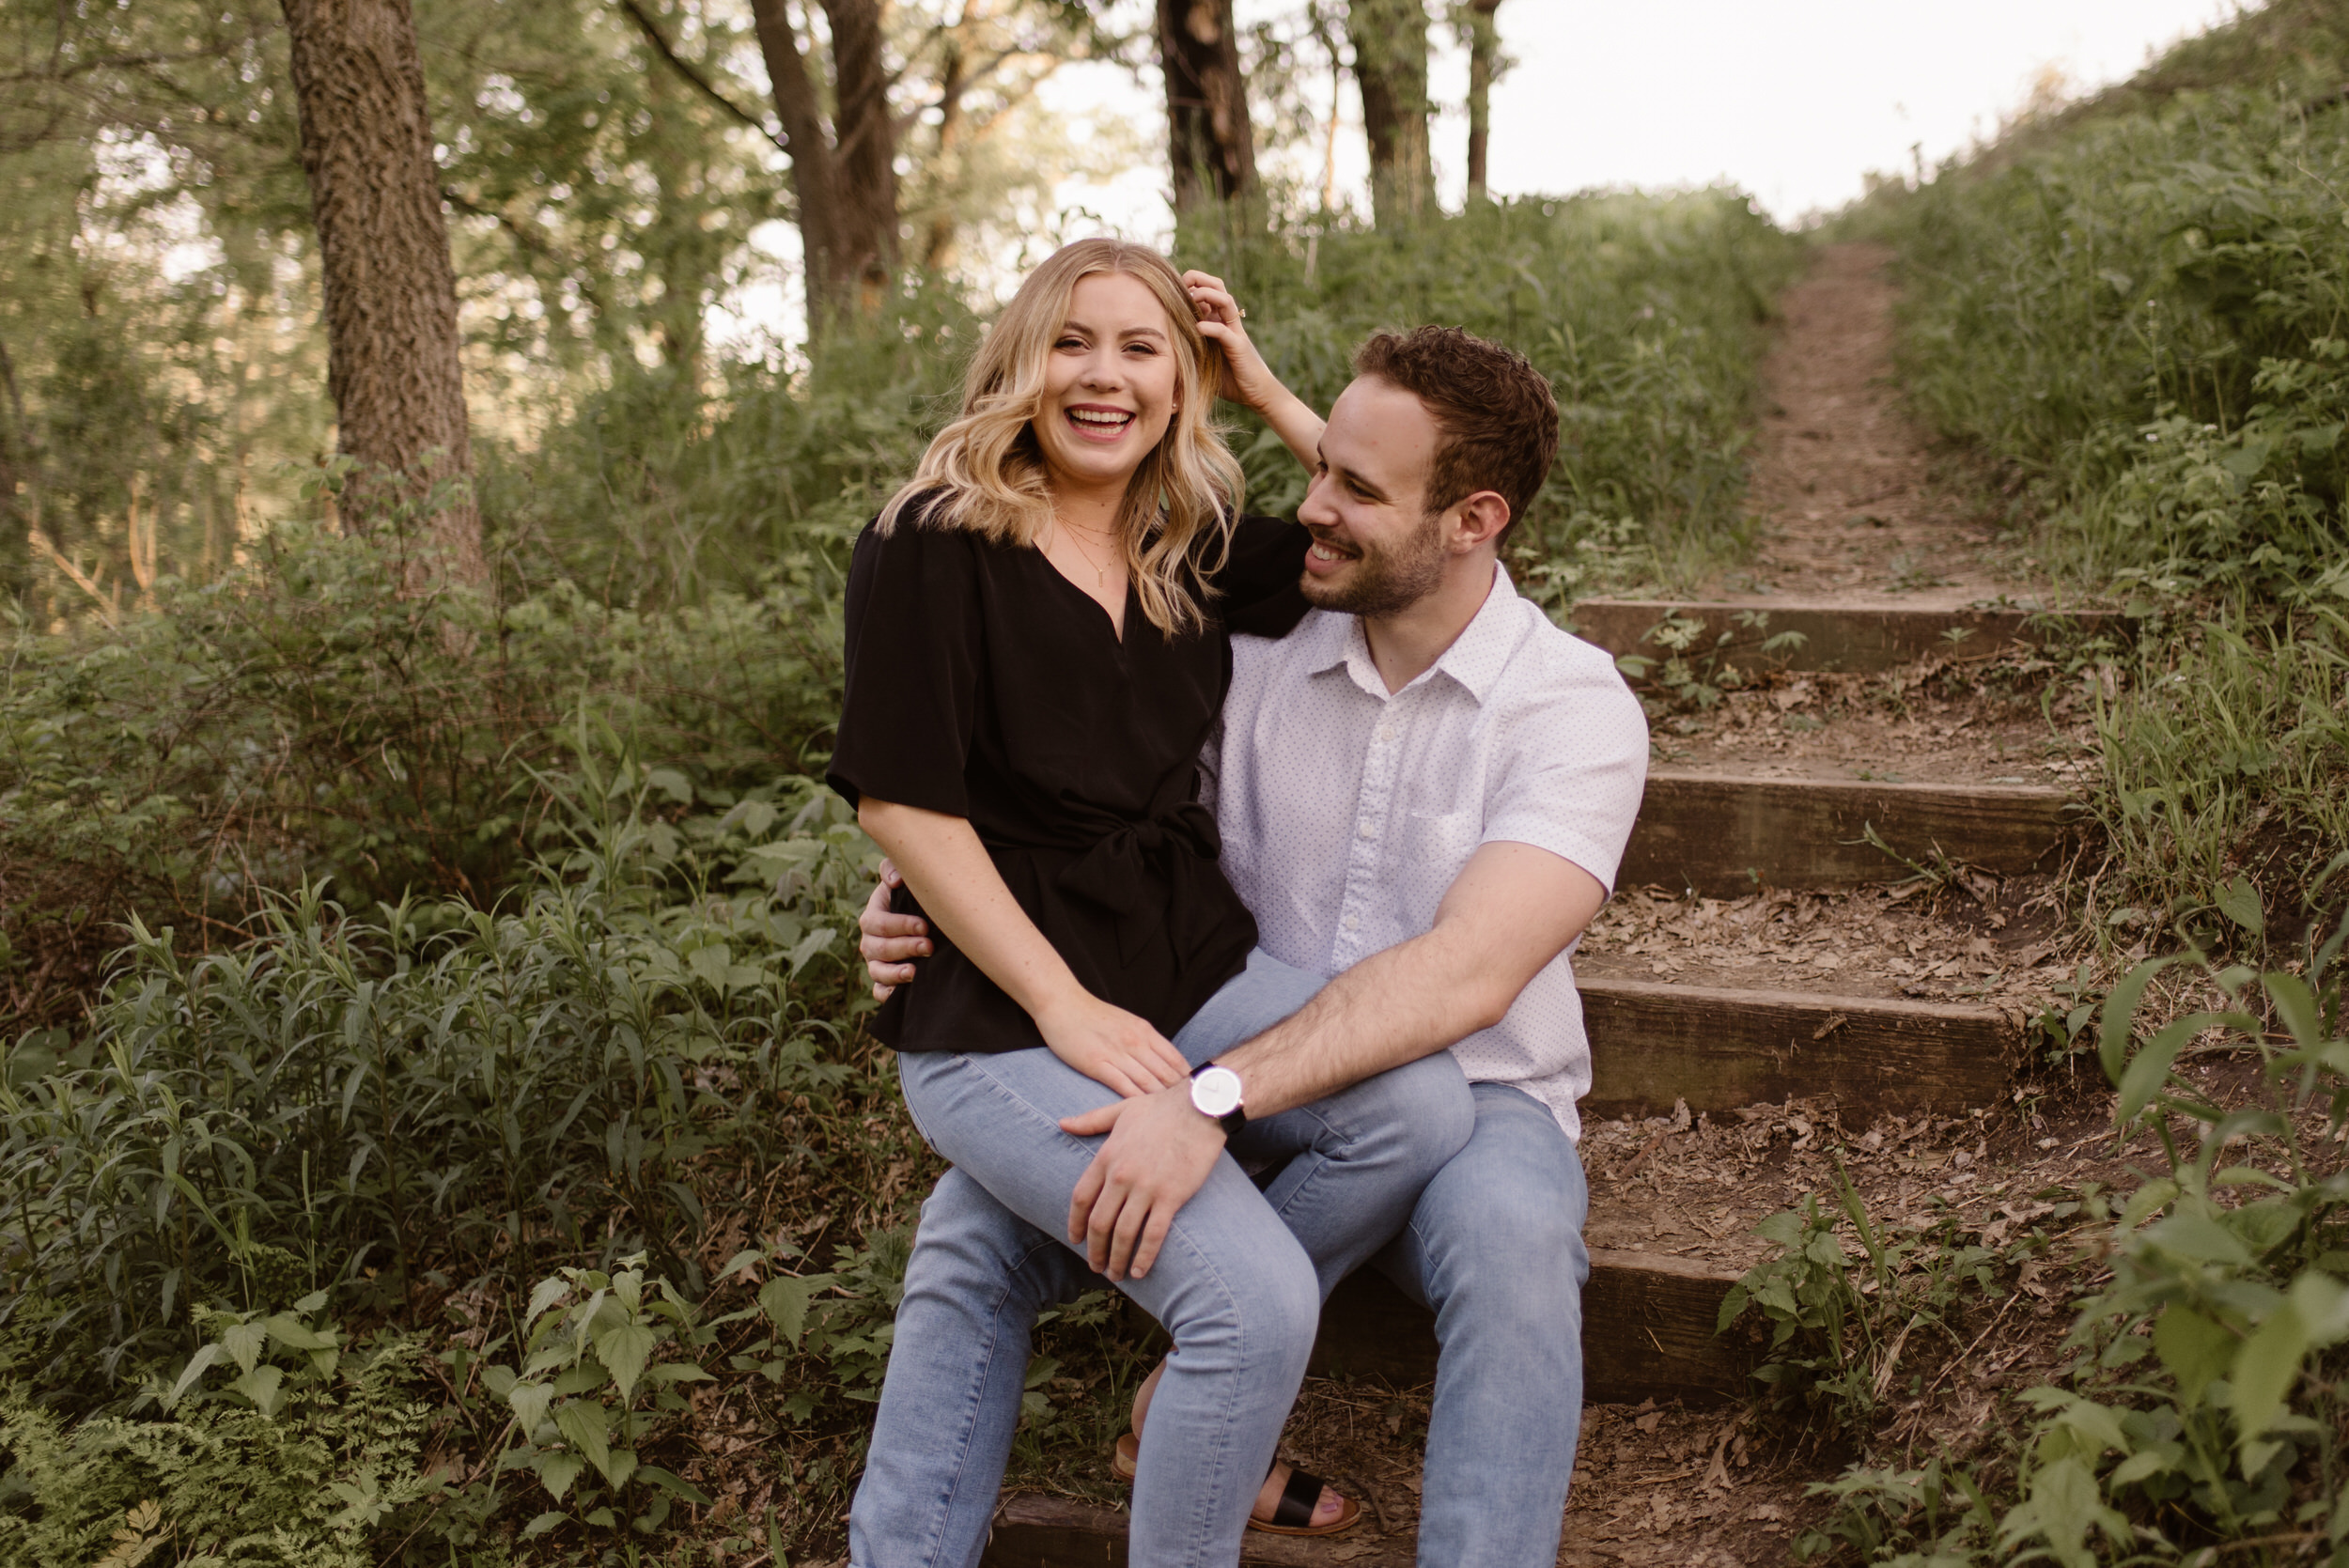 Omaha-Nebraska-Engagement-Session-Kaylie-Sirek-Photography-119.jpg